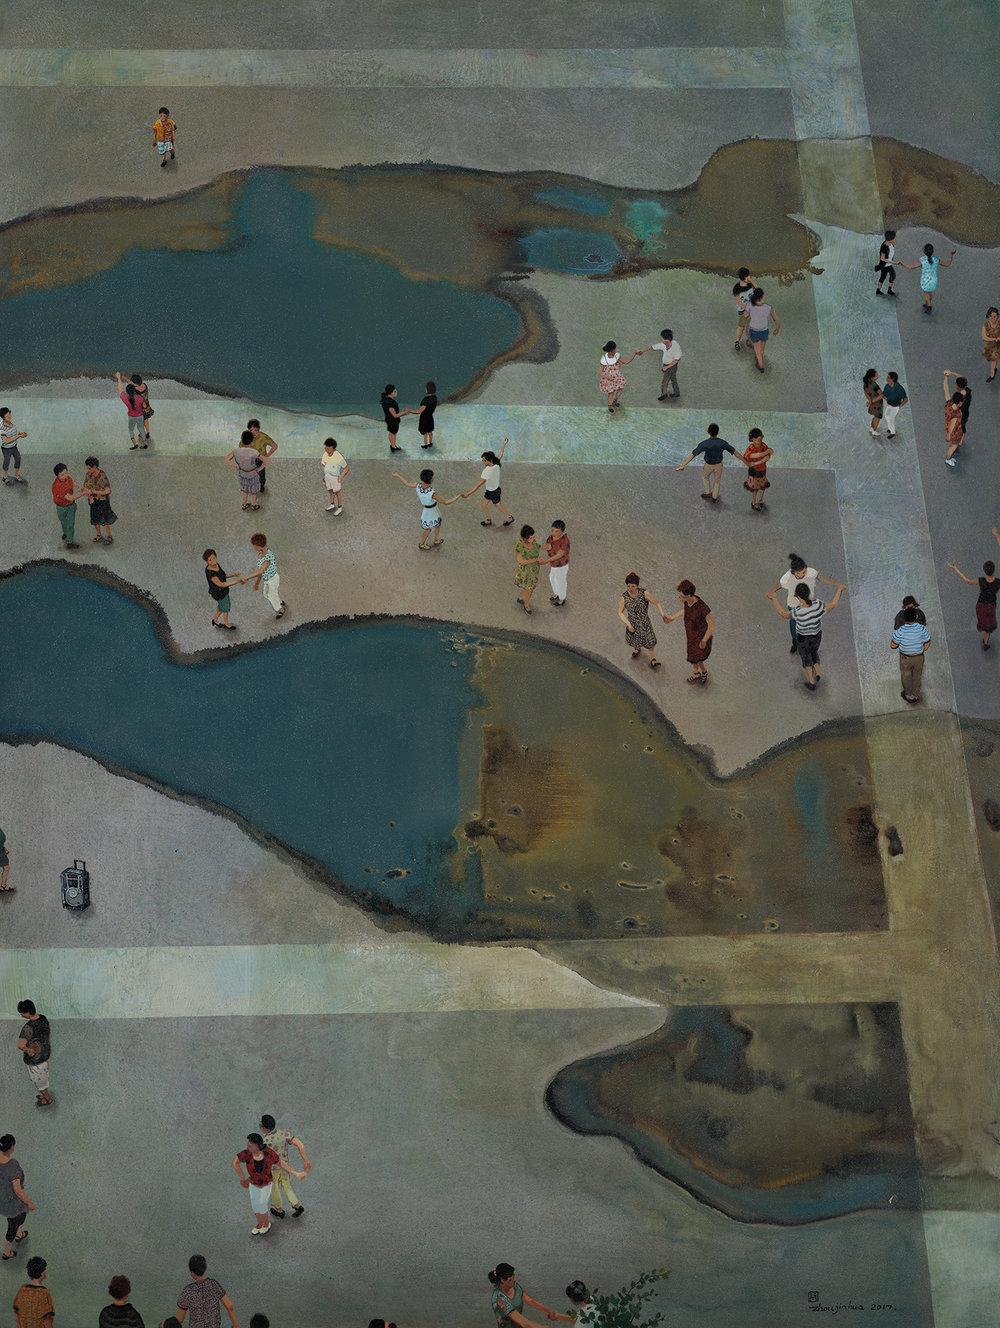 Zhou Jinhua 周金华, Wet Paradise 湿乐园 No.1, 2017, Mixed media on canvas 布面综合材料, 160 x 120 cm